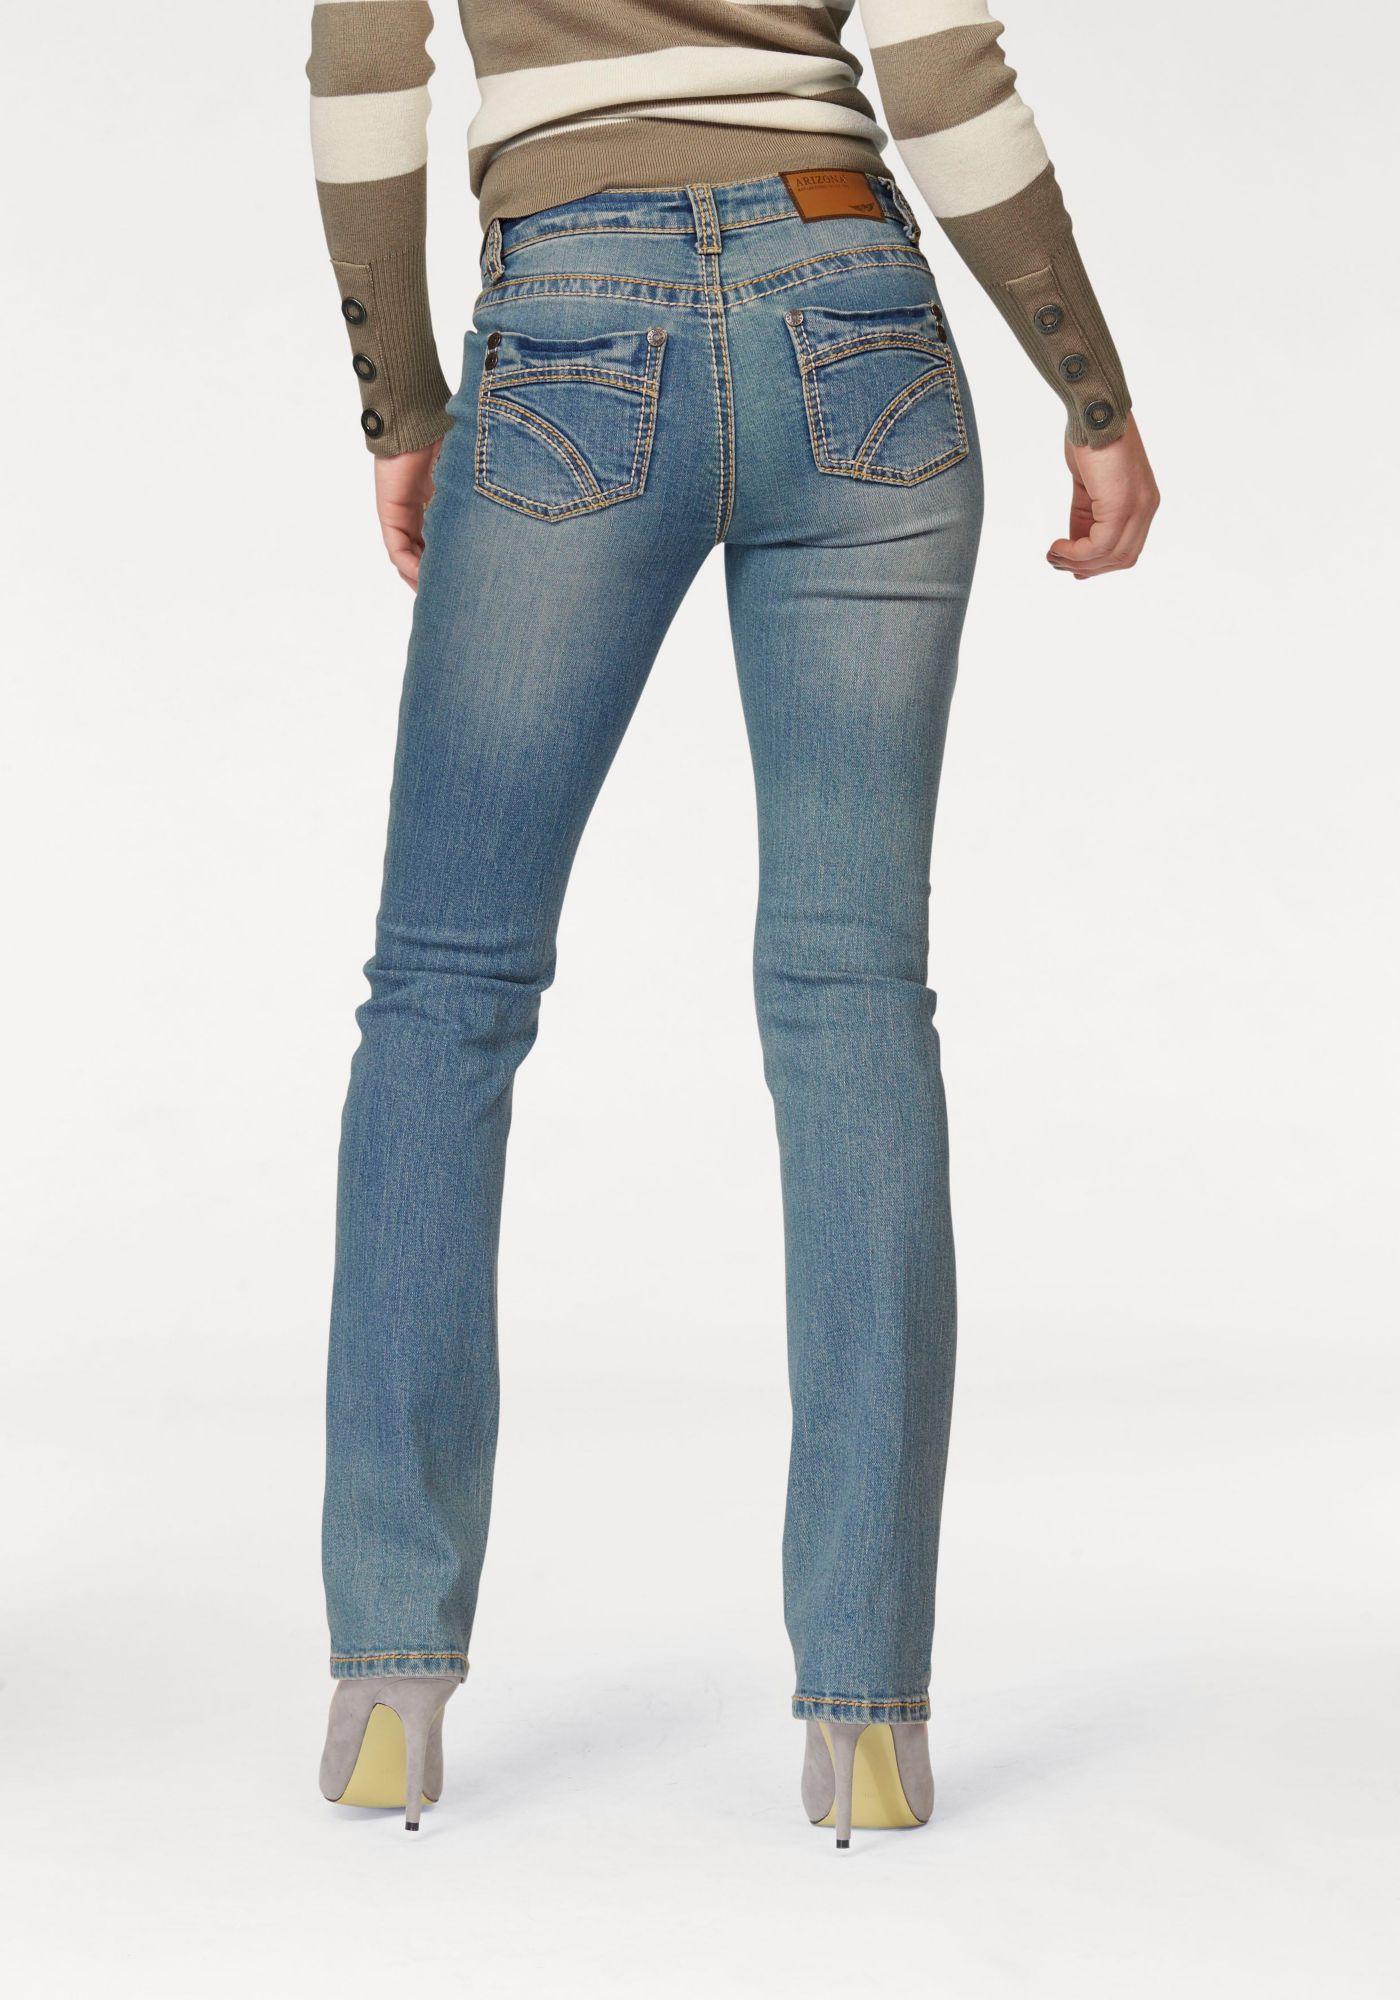 ARIZONA Arizona Gerade Jeans »Kontrastnähte«